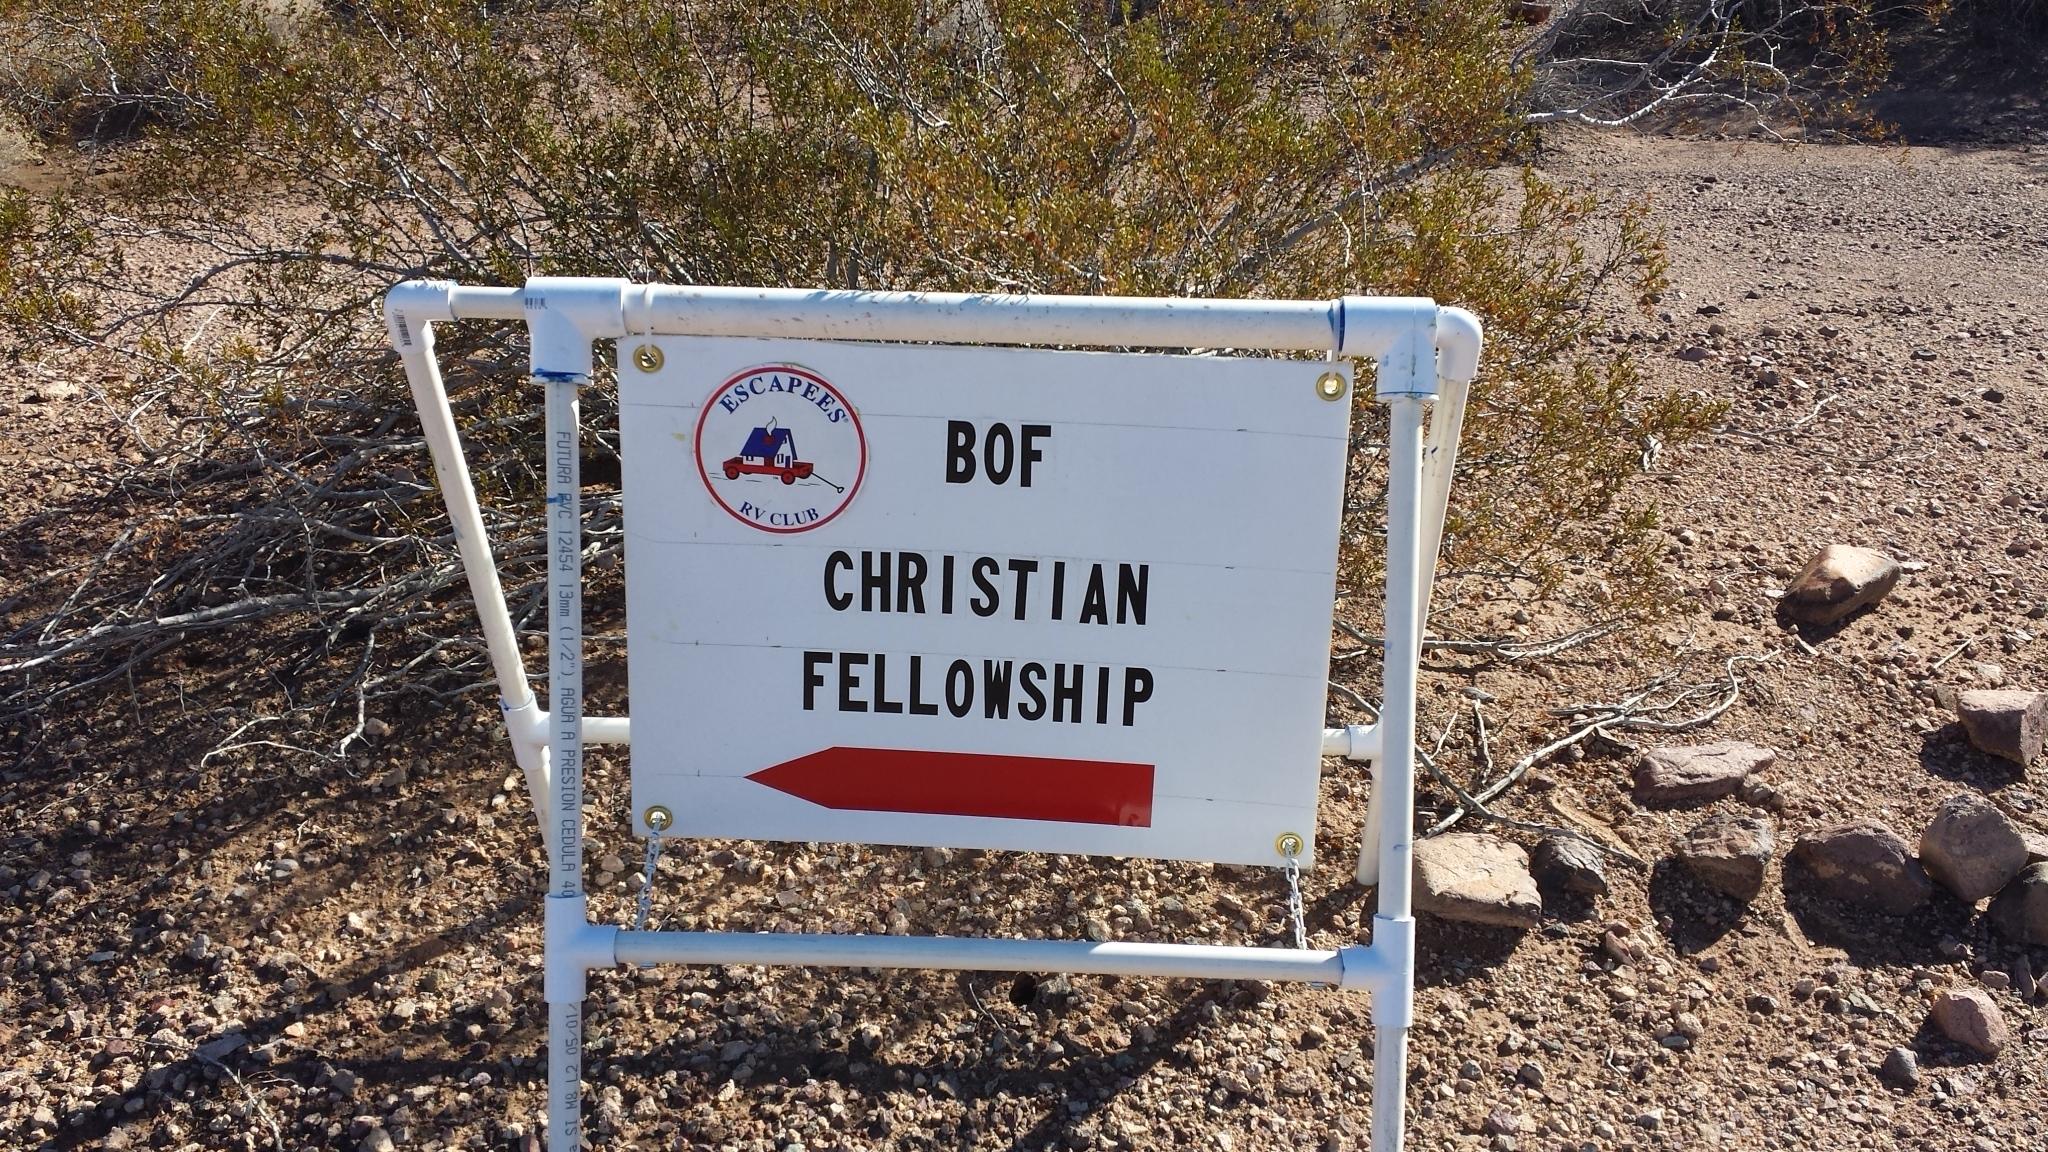 christian singles in quartzsite Nca assembly of god | flagstaff, az | northland christian .